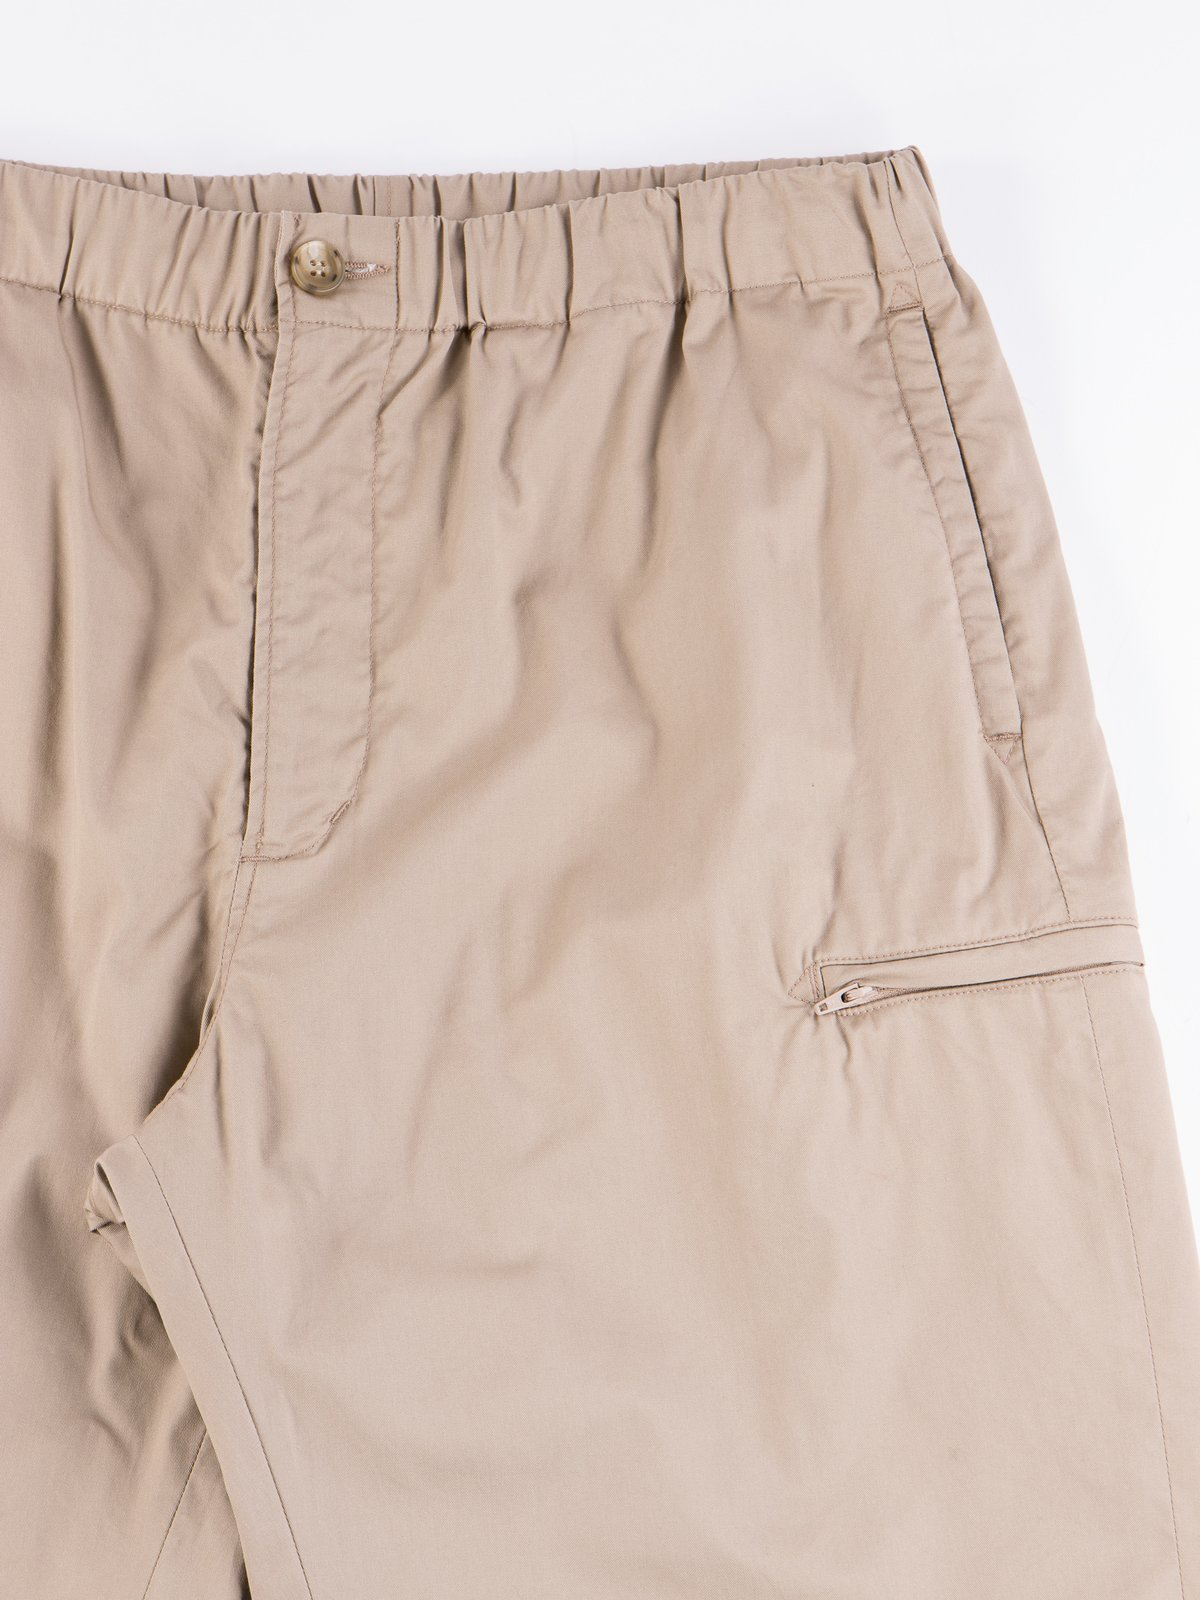 Khaki Highcount Twill Drawstring Pant - Image 4